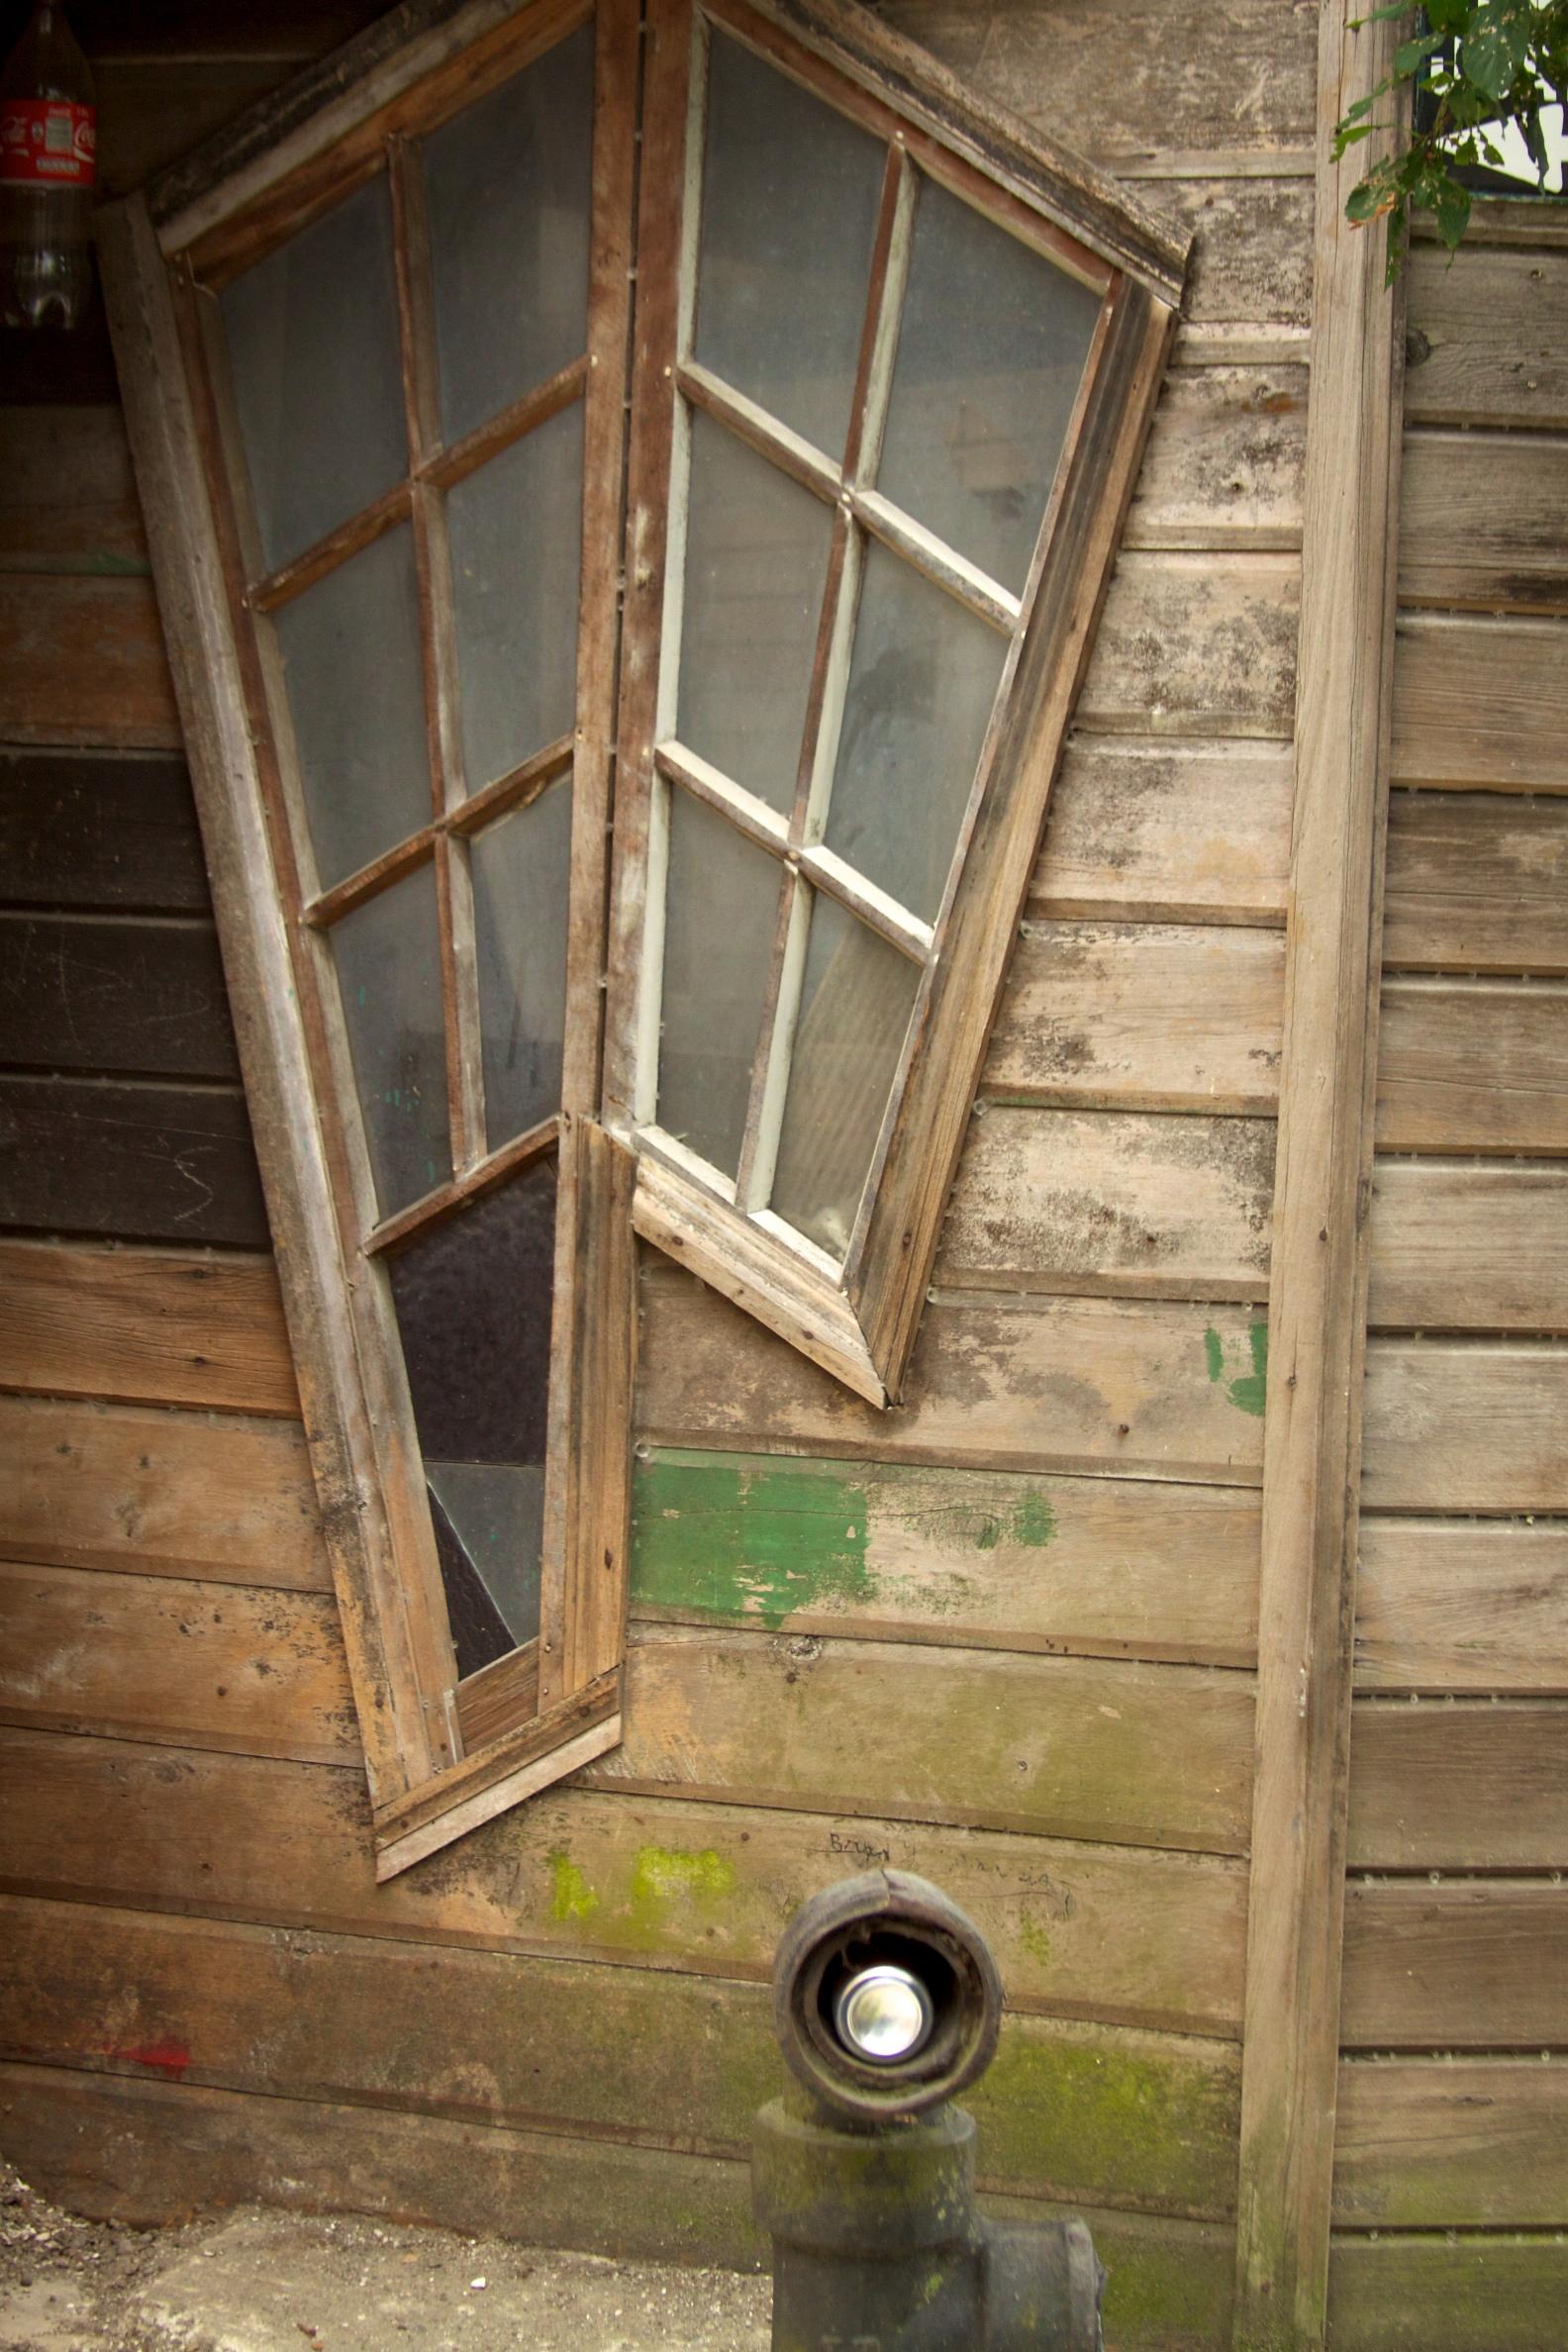 Antique Windows Filechile Puerto Montt 32 Antique Window Panes 6837507764